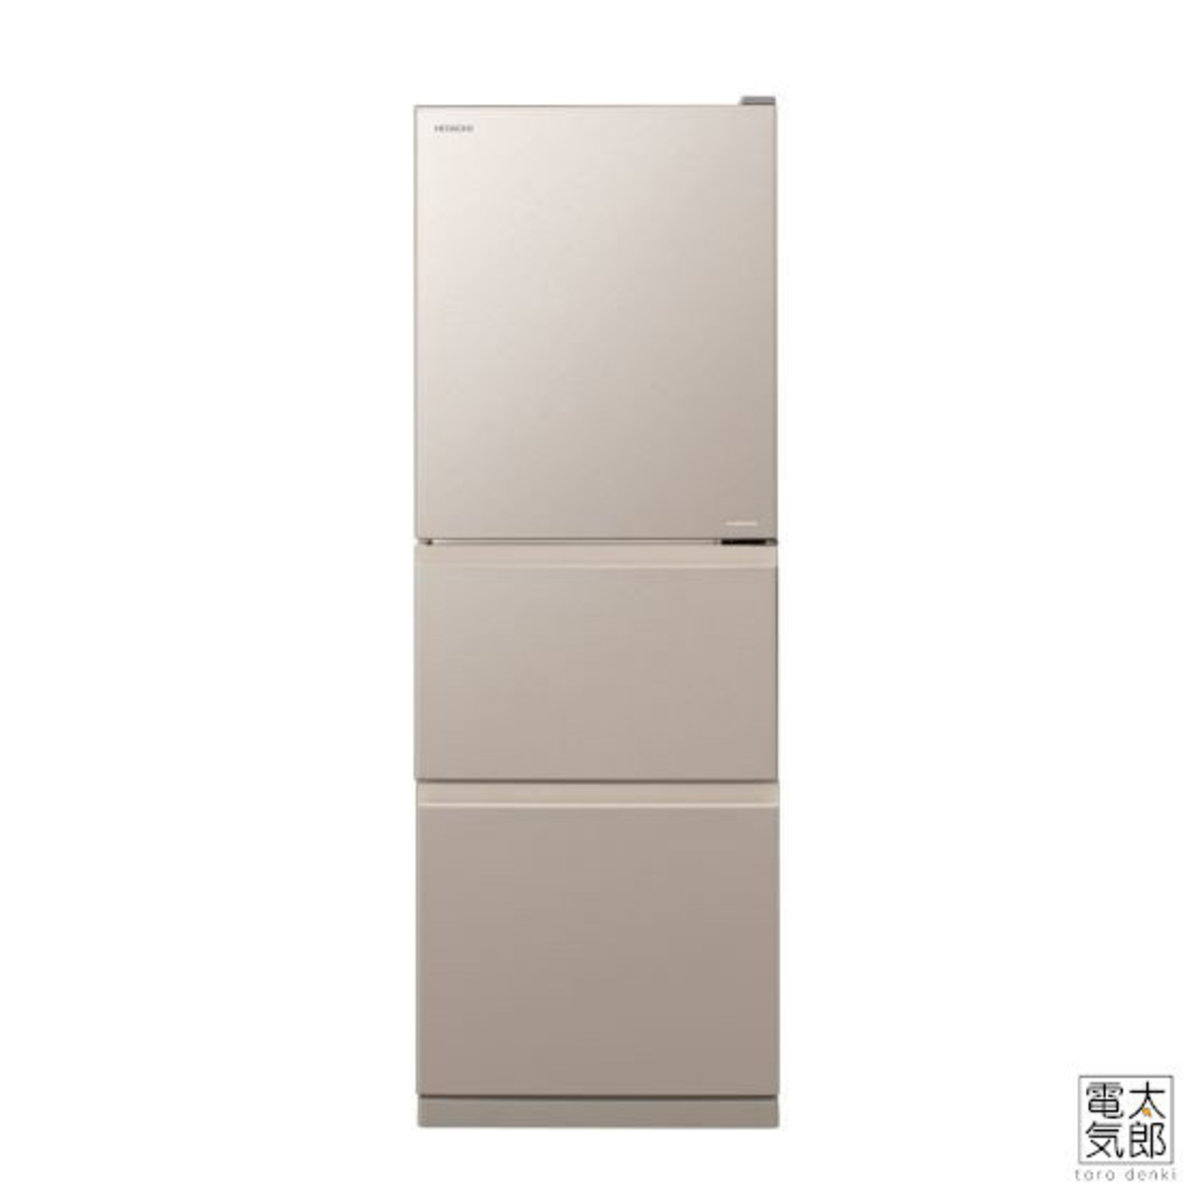 Hitachi - 3-Door Refrigerator Champagne Silver R-S28KPH